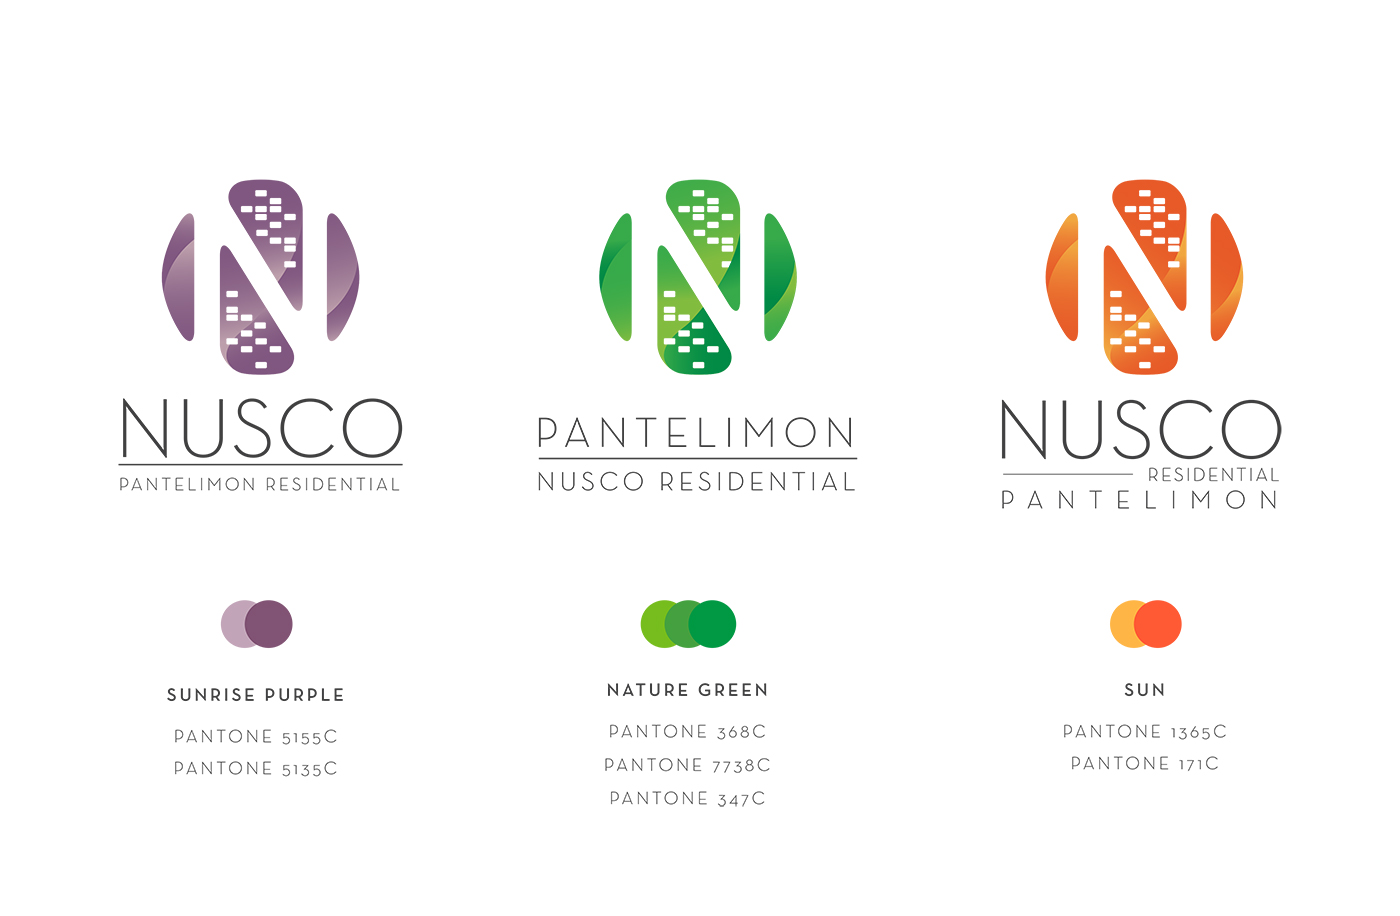 Nusco-Branding-20